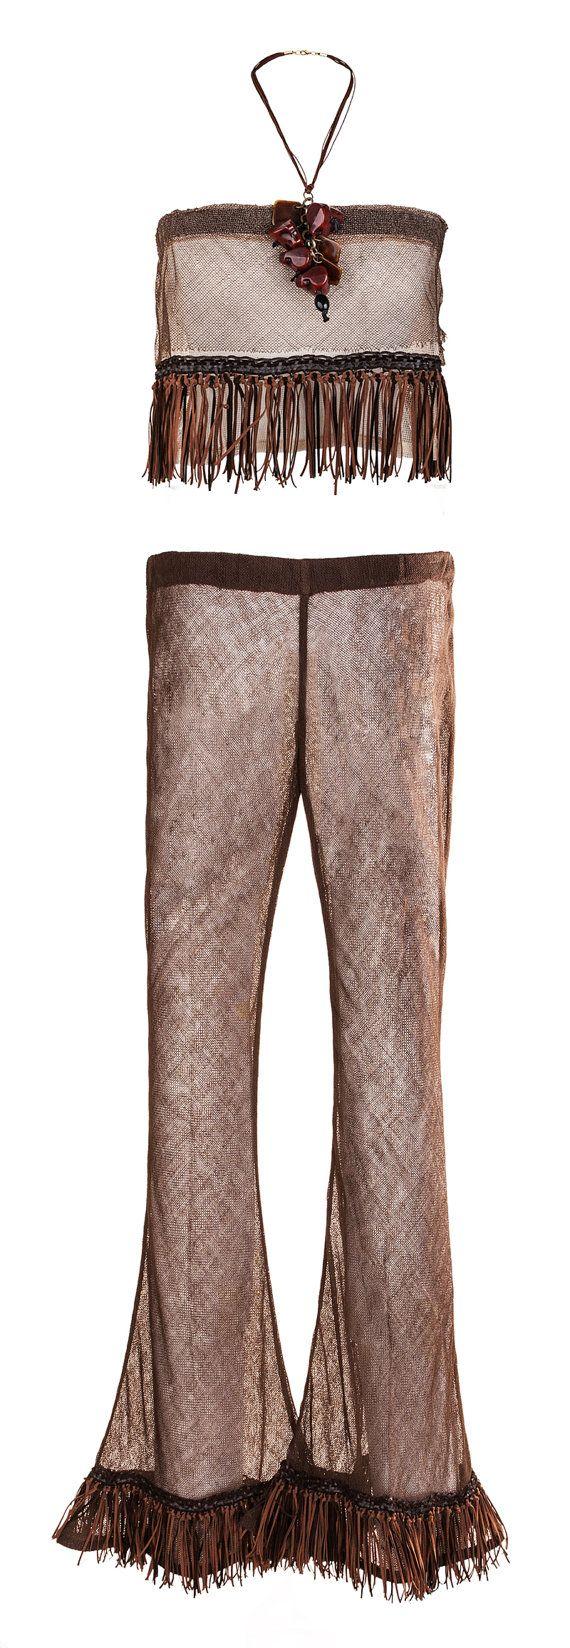 Nude look Pants and Top. Viscose lace mesh napa di AltaModaDonna